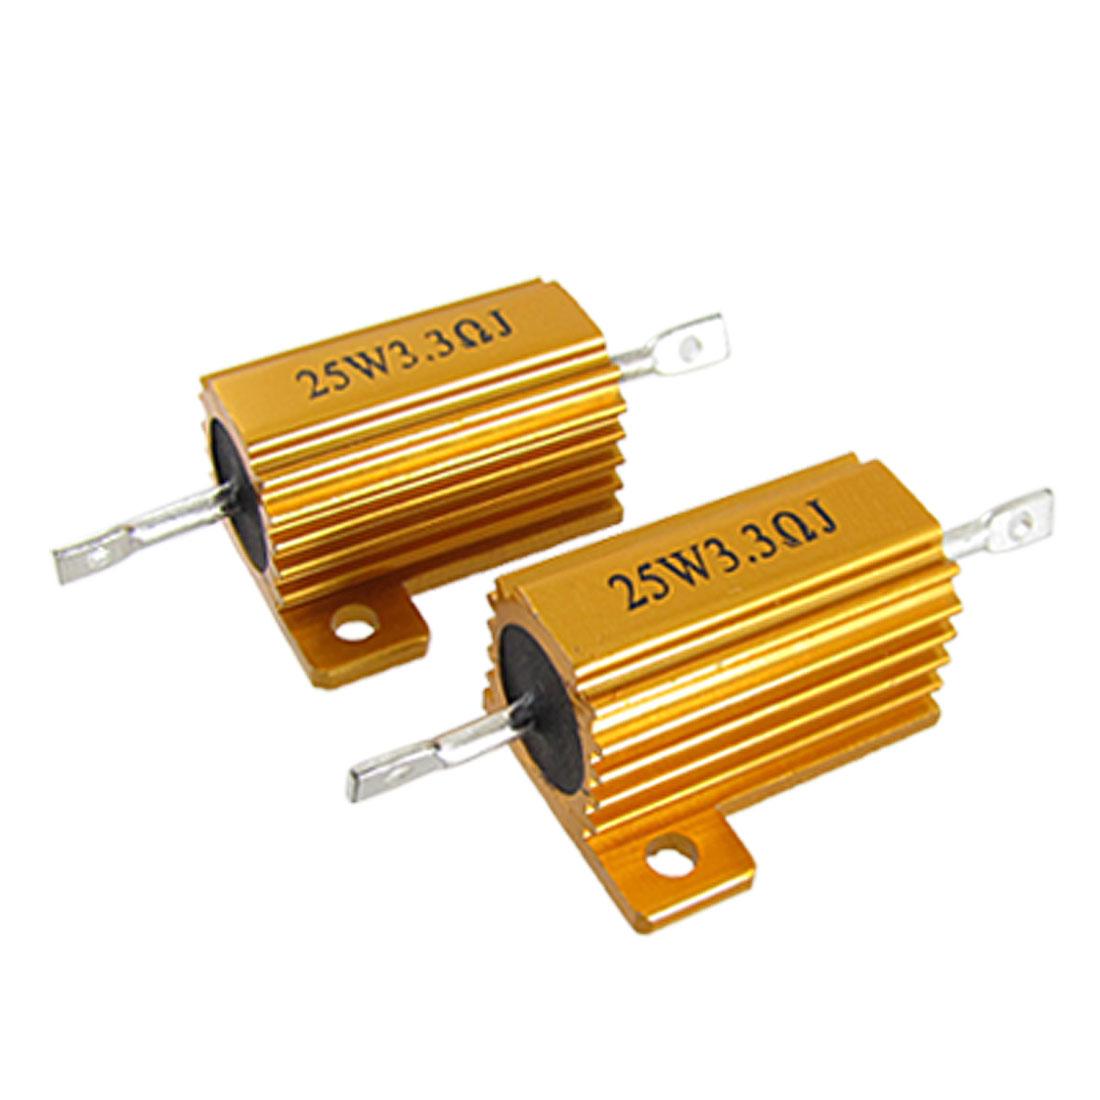 Gold Tone 25W 3.3 Ohm 5% Aluminum Case Wirewound Resistors 2 Pcs